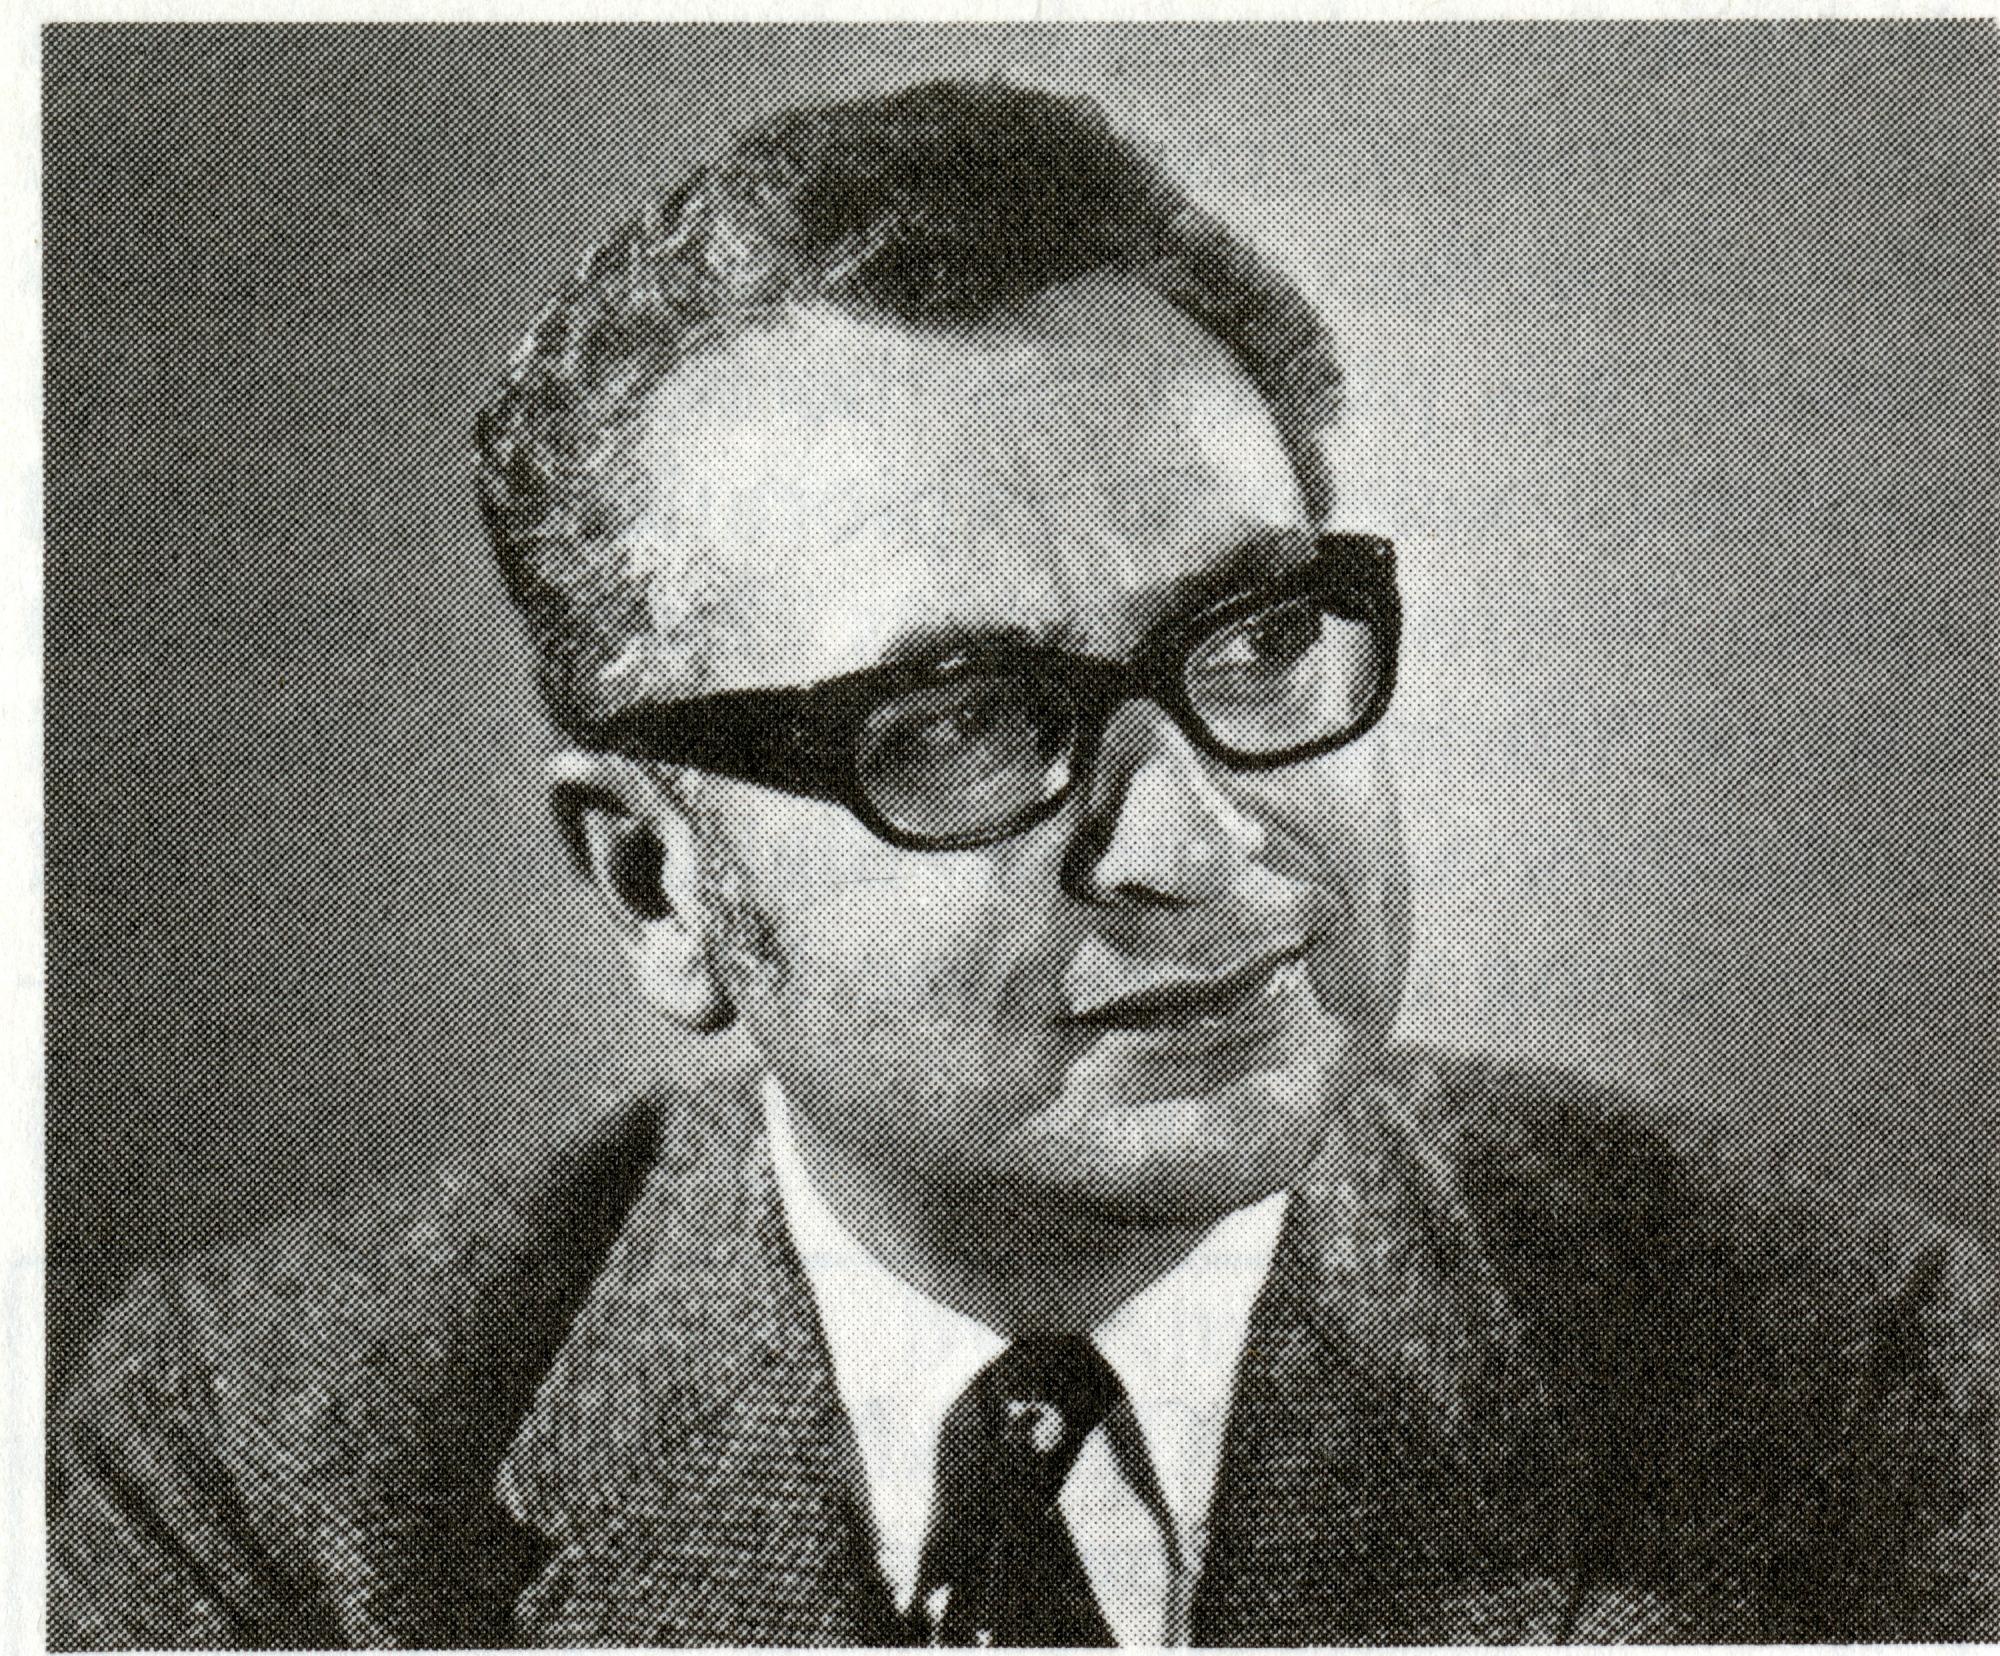 Aug 31 Dr. Murray Gell-Mann